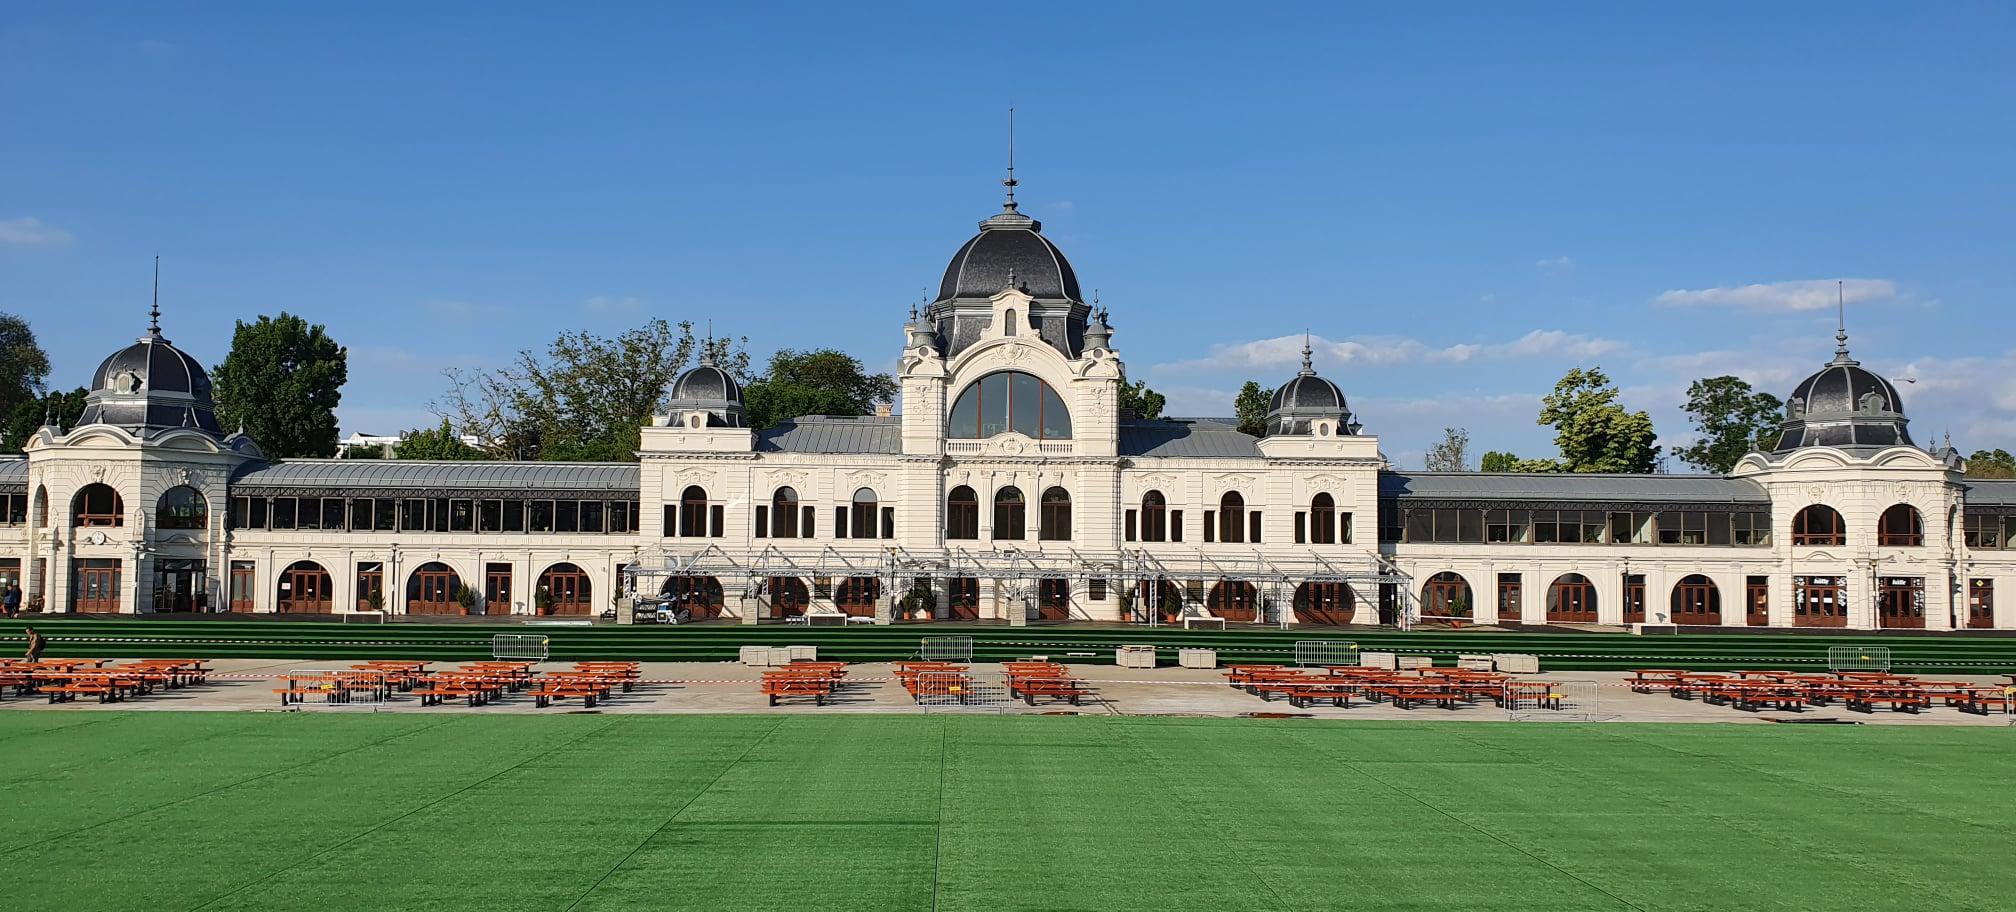 Budapest football